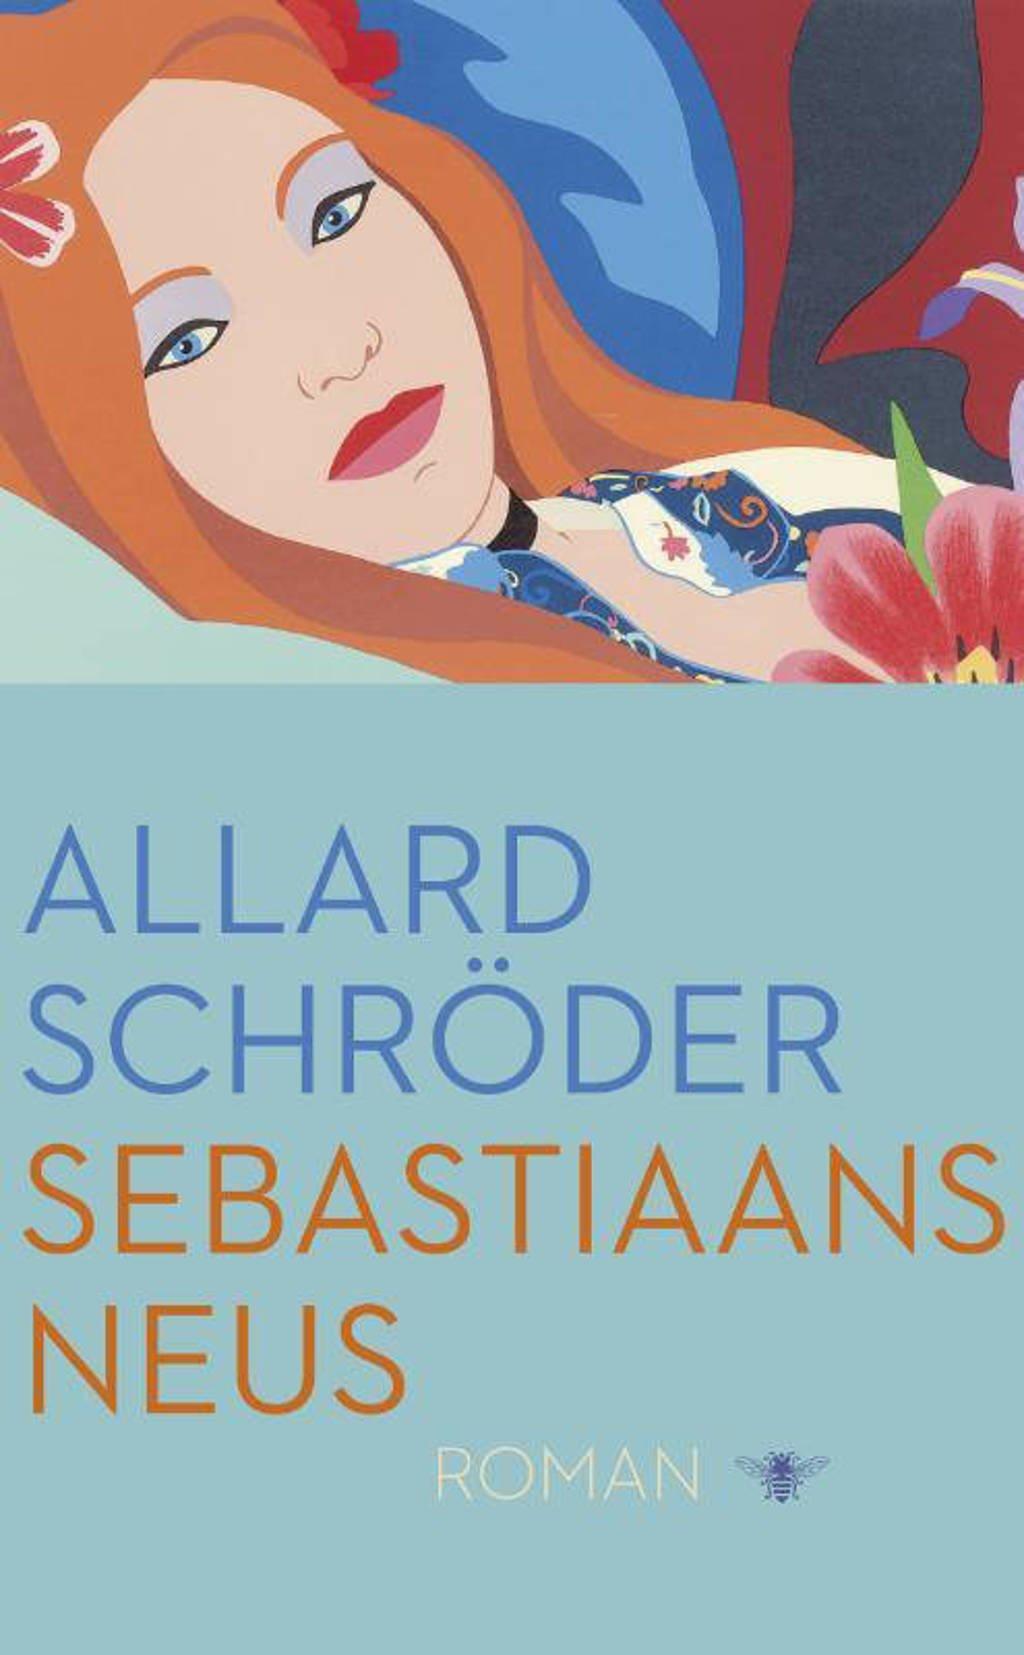 Sebastiaans neus - Allard Schröder